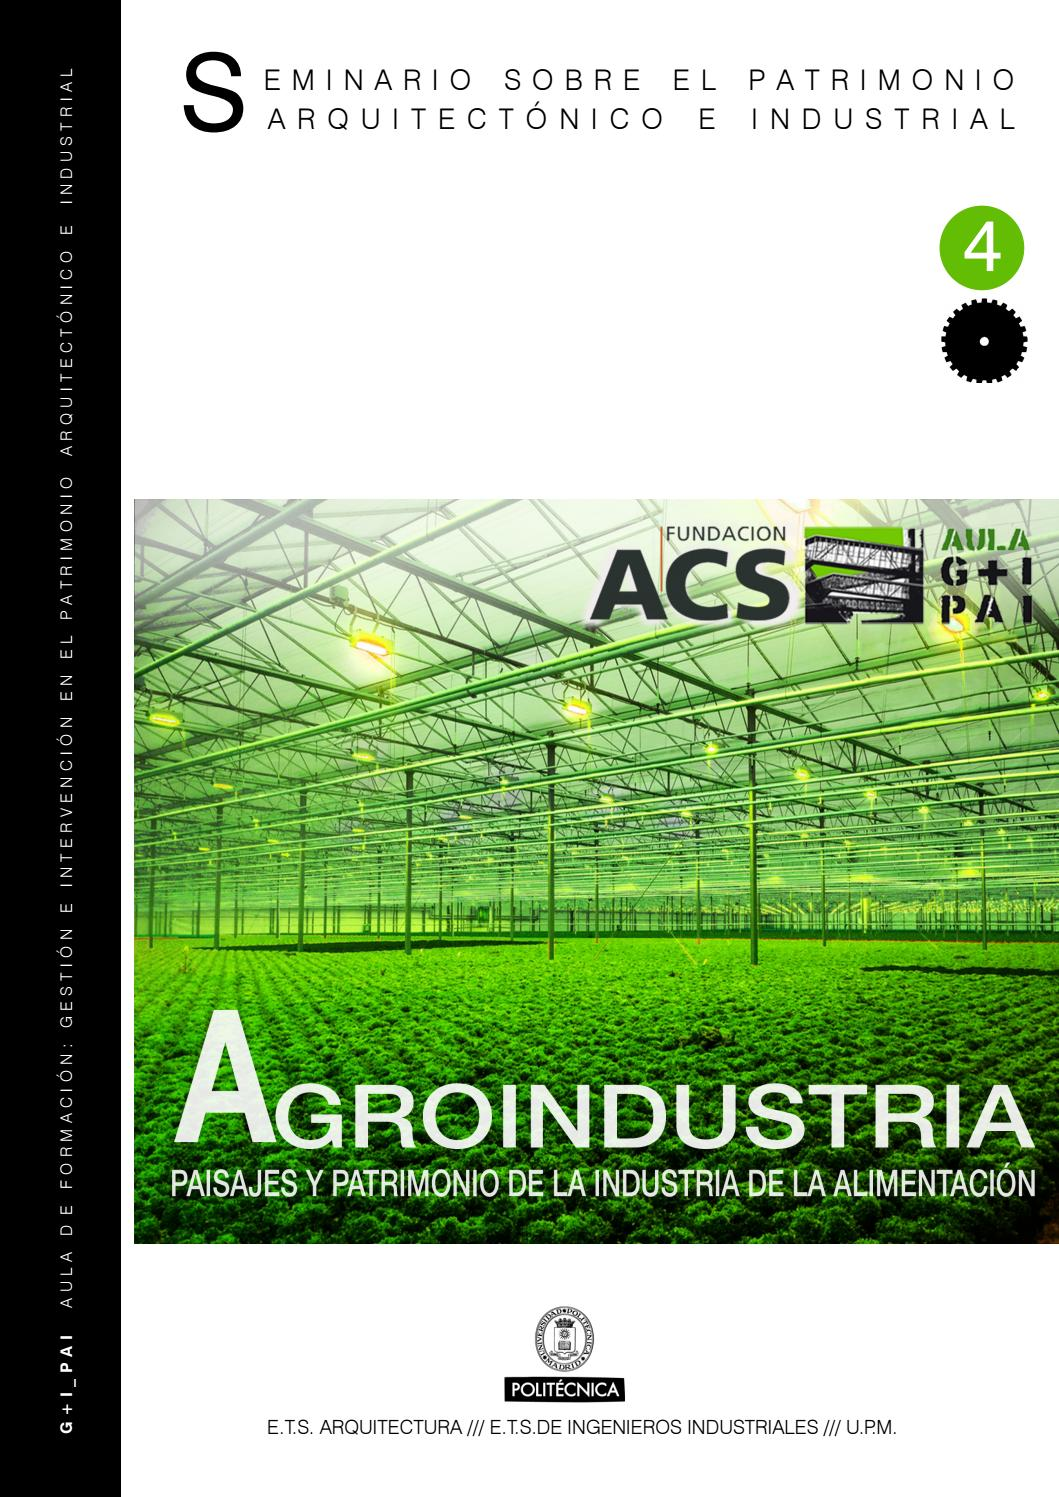 Actas Del Iv Seminario Agroindustria By Aula G I Pai Issuu